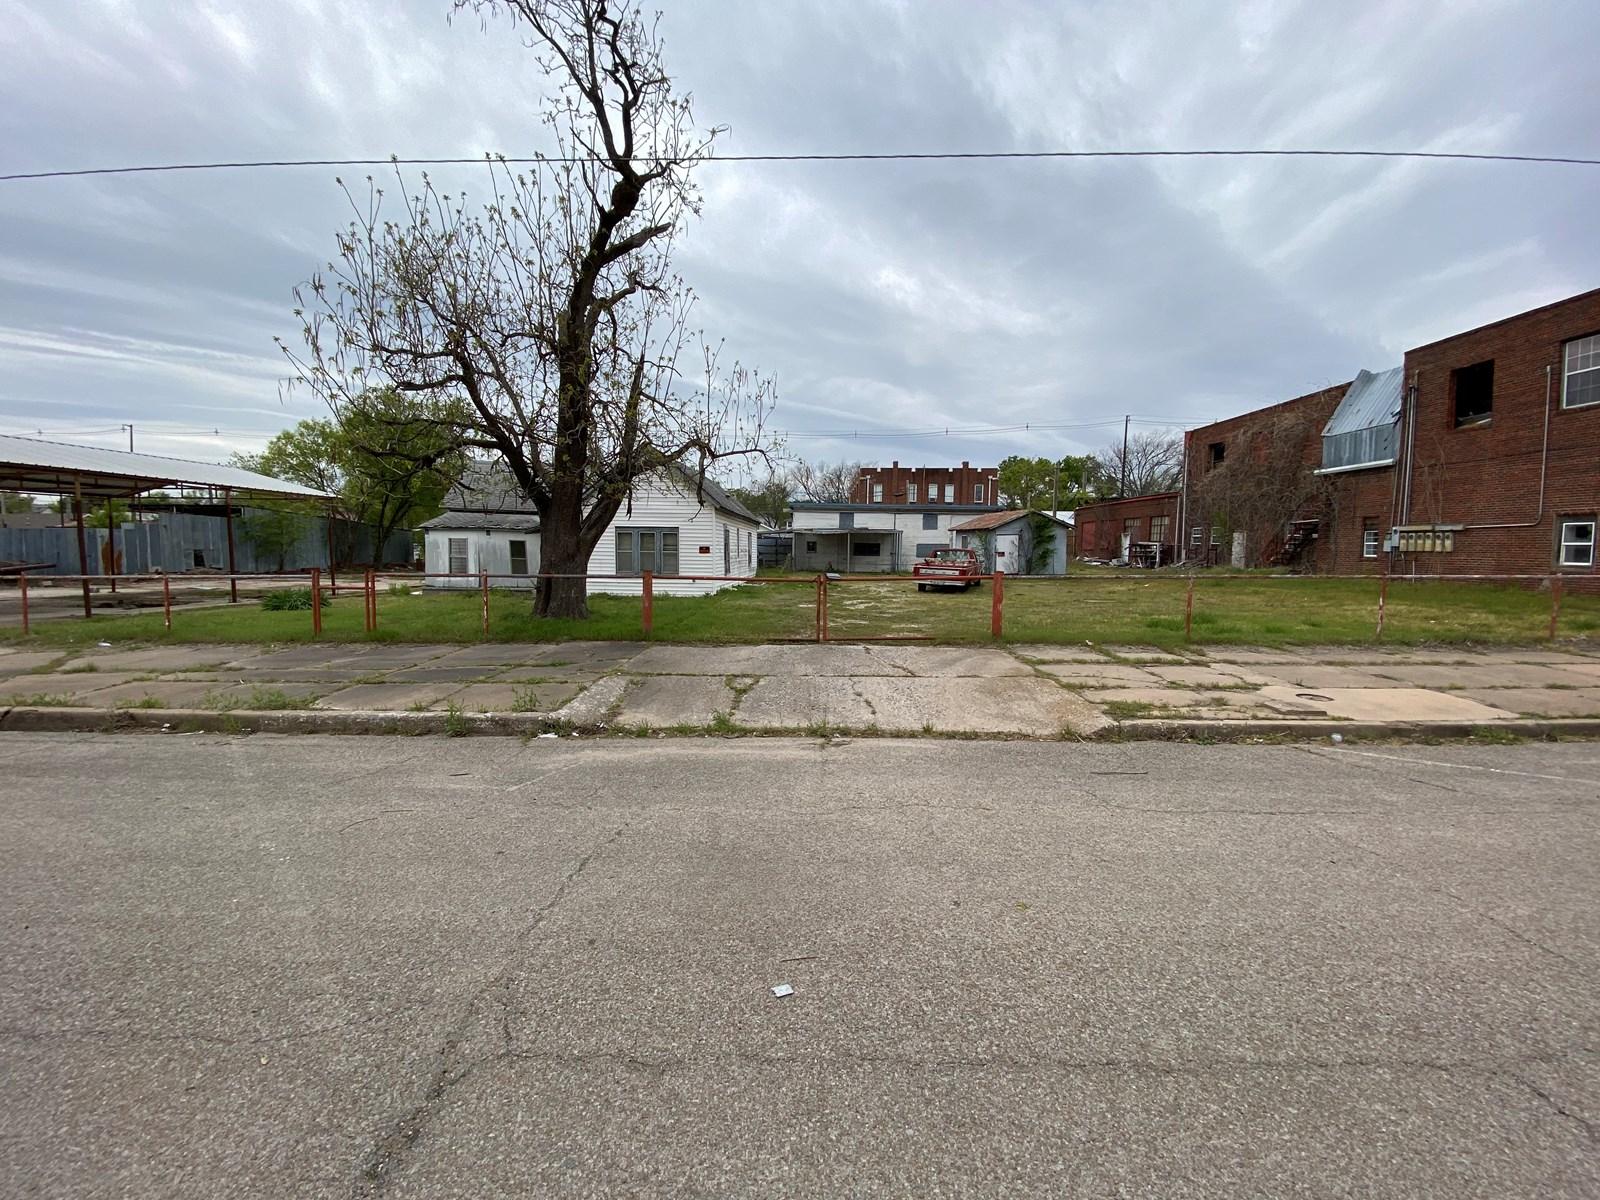 Commercial Property On Main St. Fairfax OK